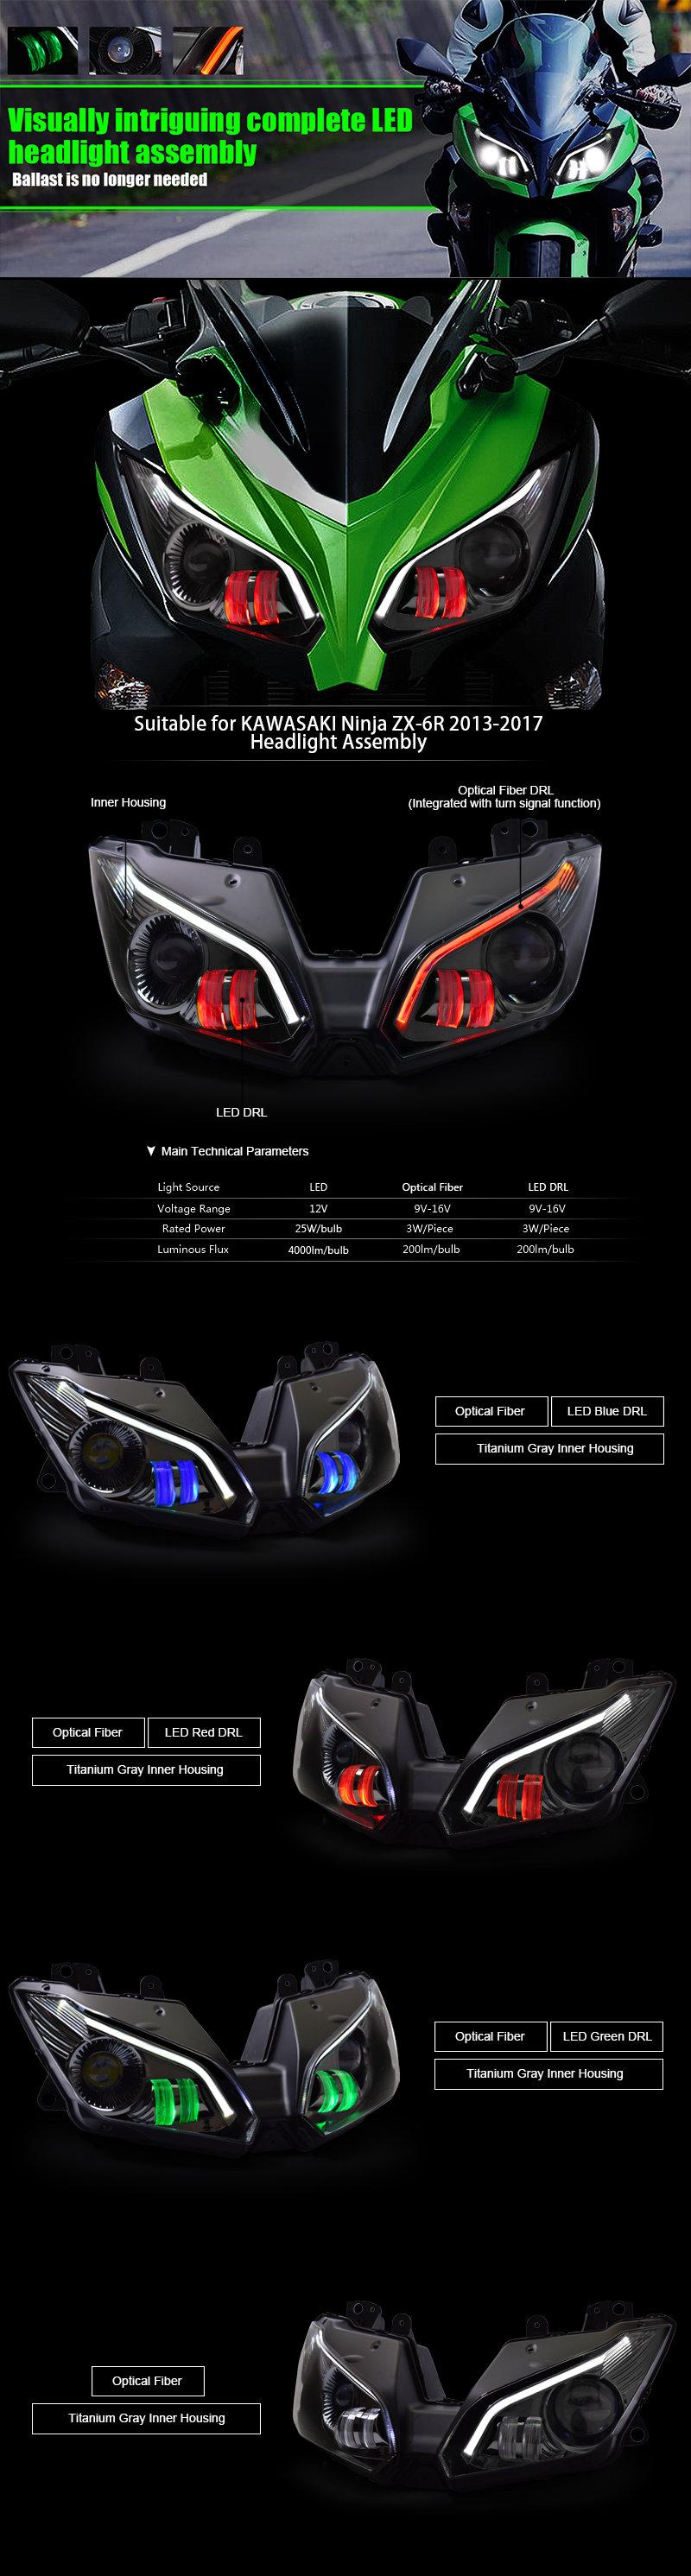 Kawasaki ZX6R Headlight 2013 2014 2015 2016 2017